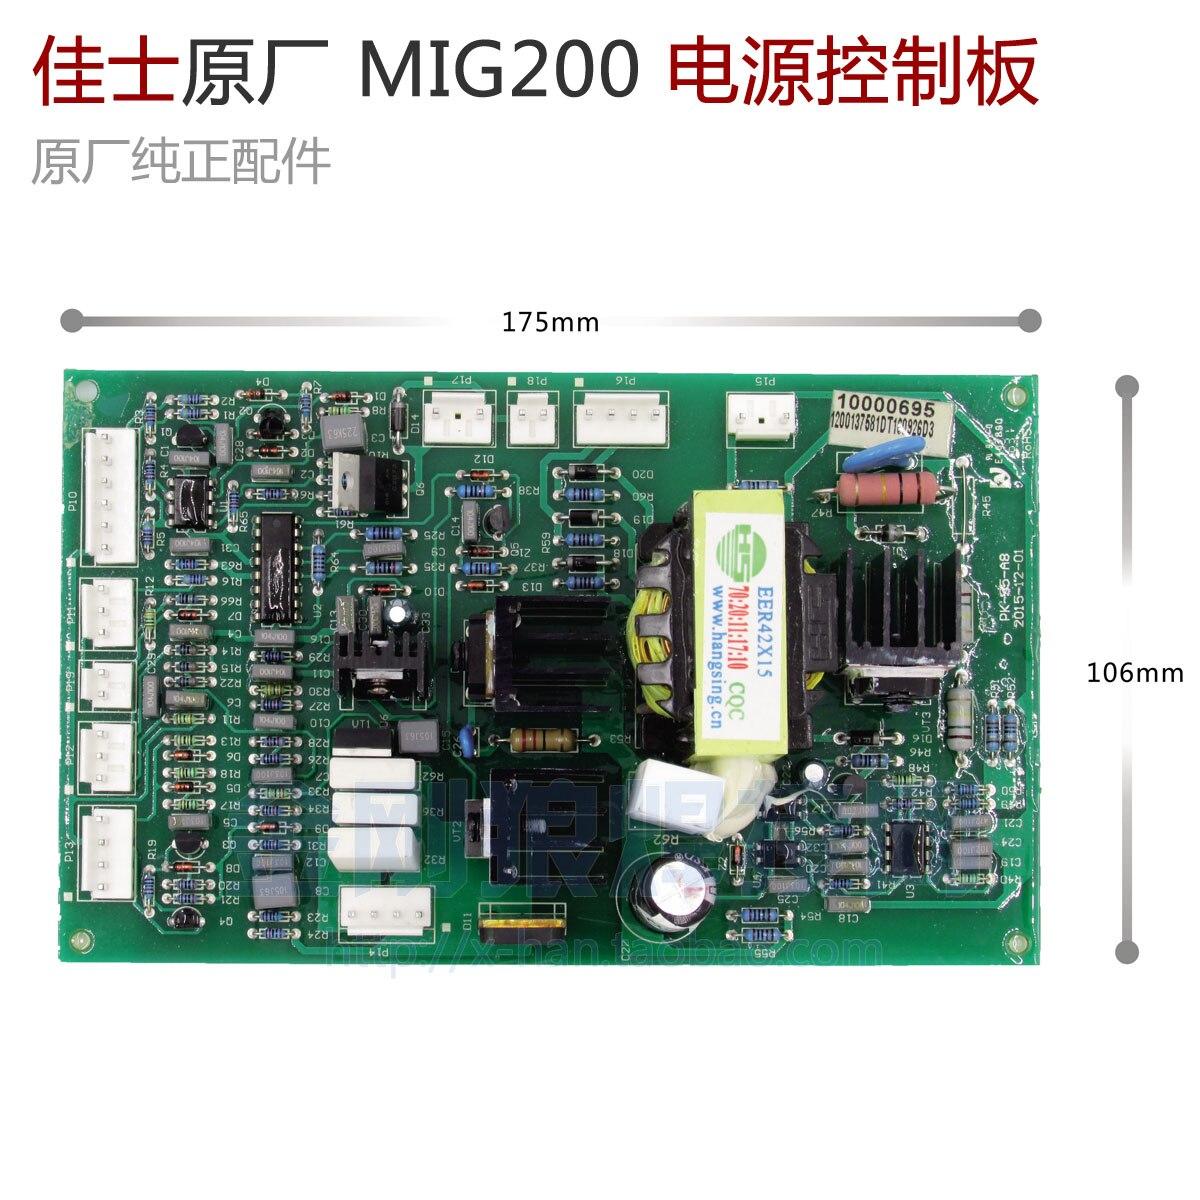 цена на Shenzhen original factory MIG200 gas shielded welding power panel control panel MIG250 MIG270 F